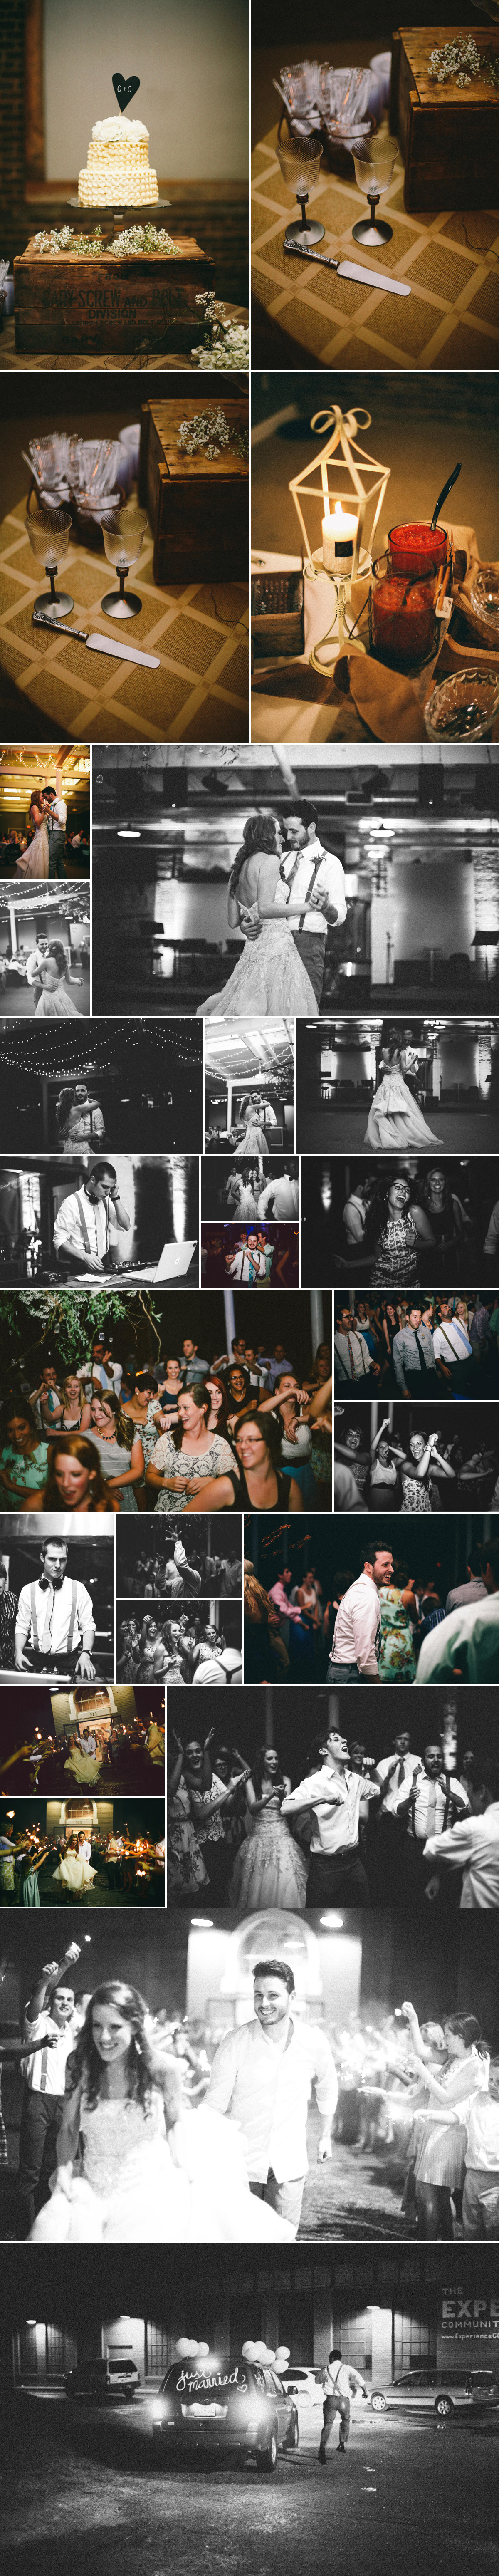 Blog-Collage-1378086082635.jpg